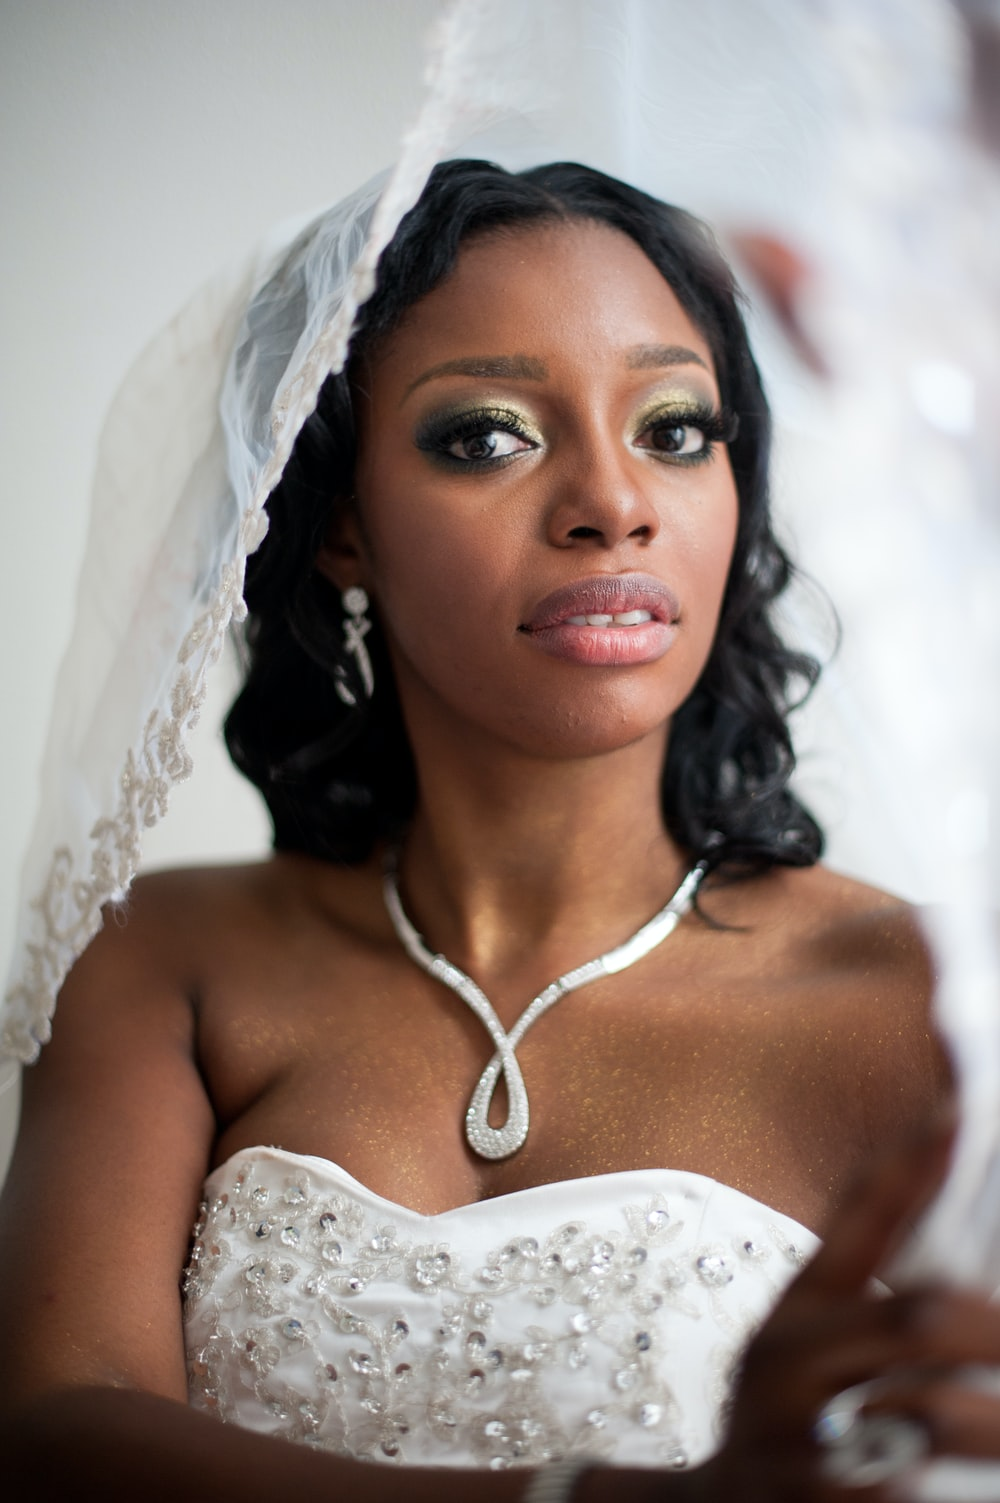 selective focus photo woman wearing wedding veil